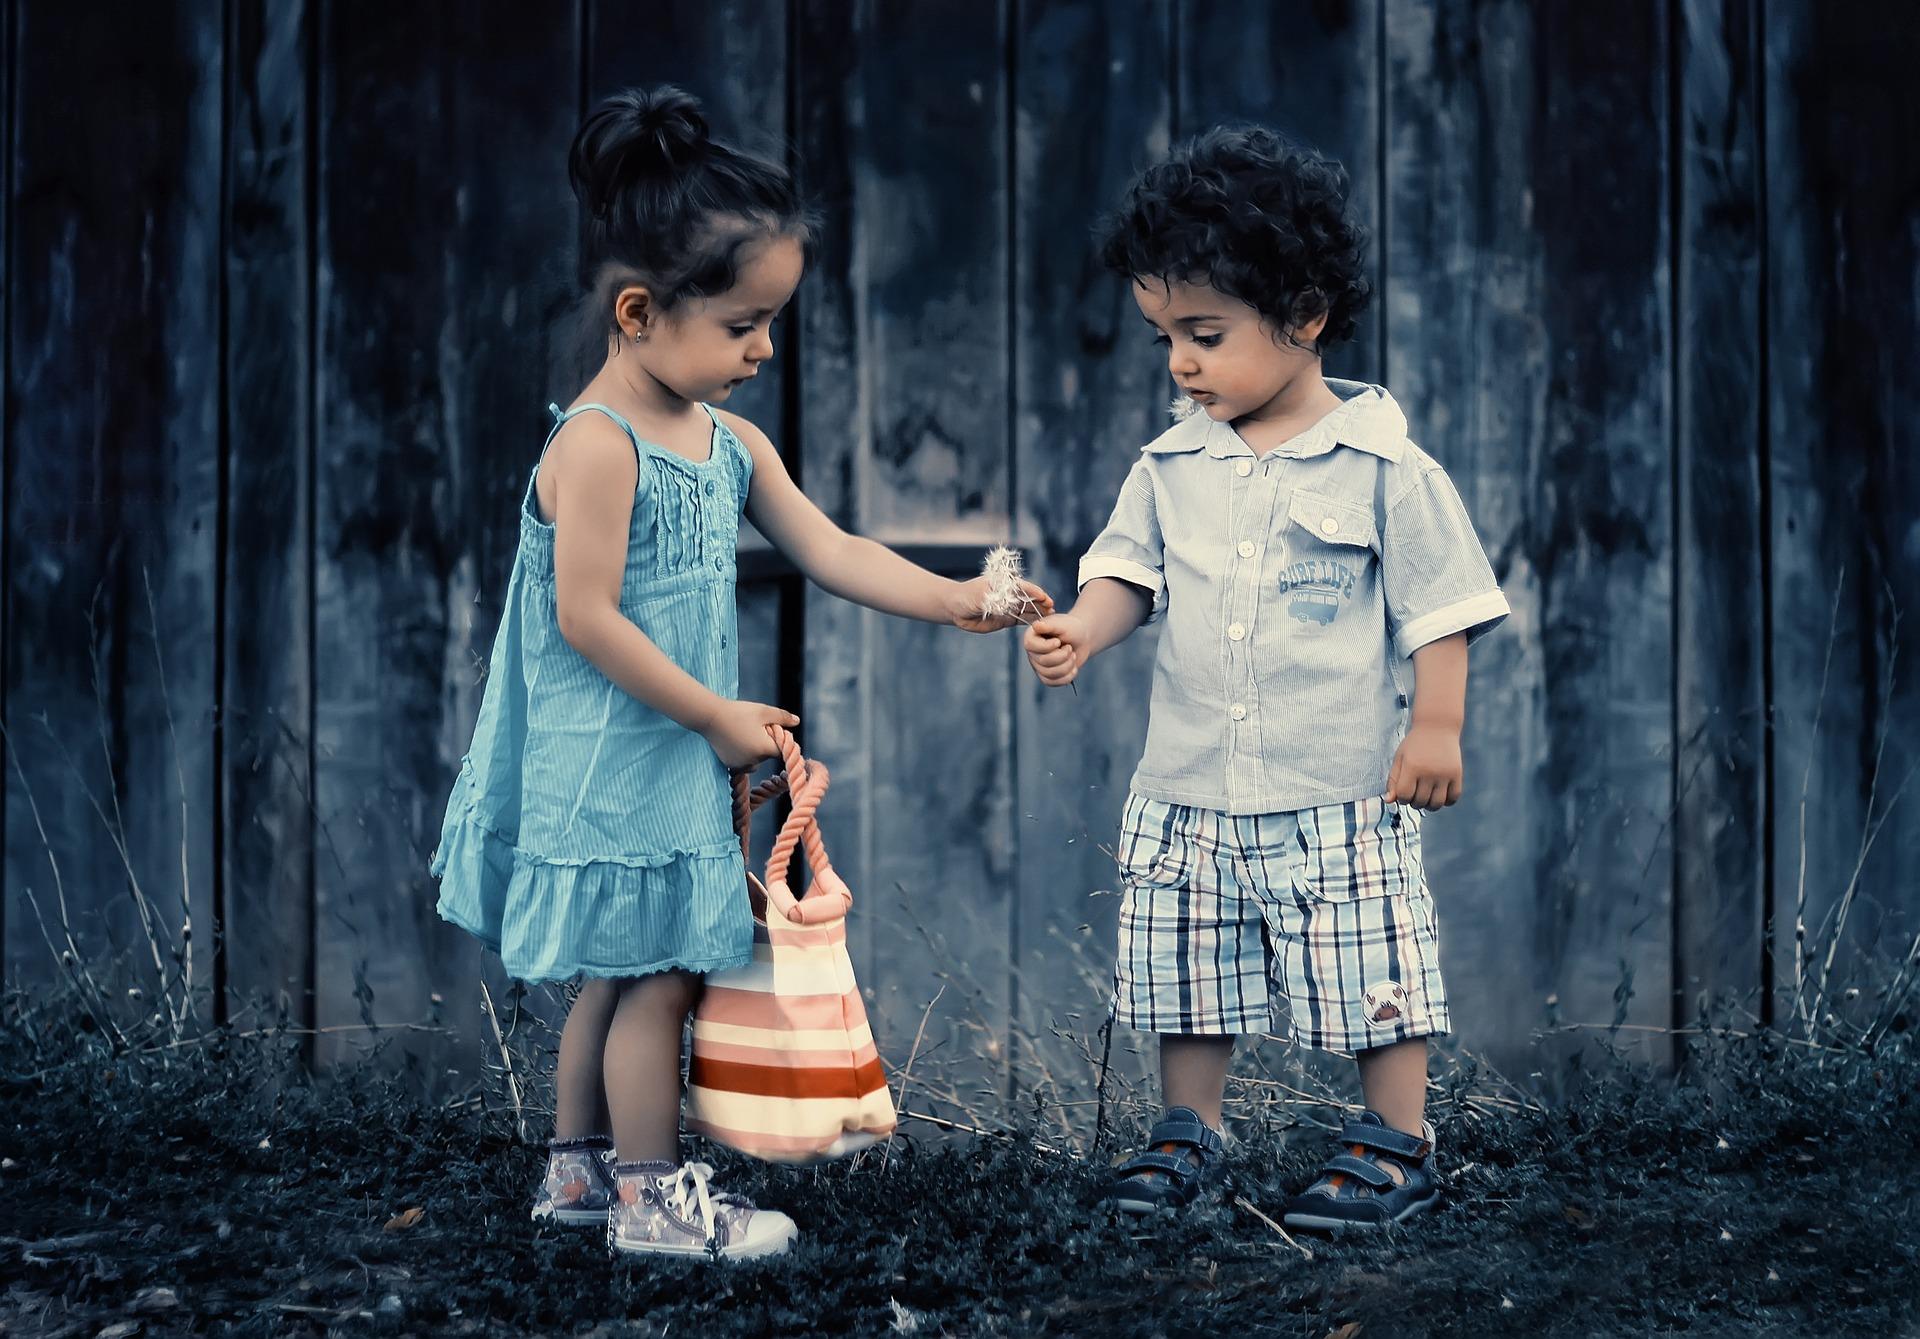 I bambini di oggi e le loro risorse